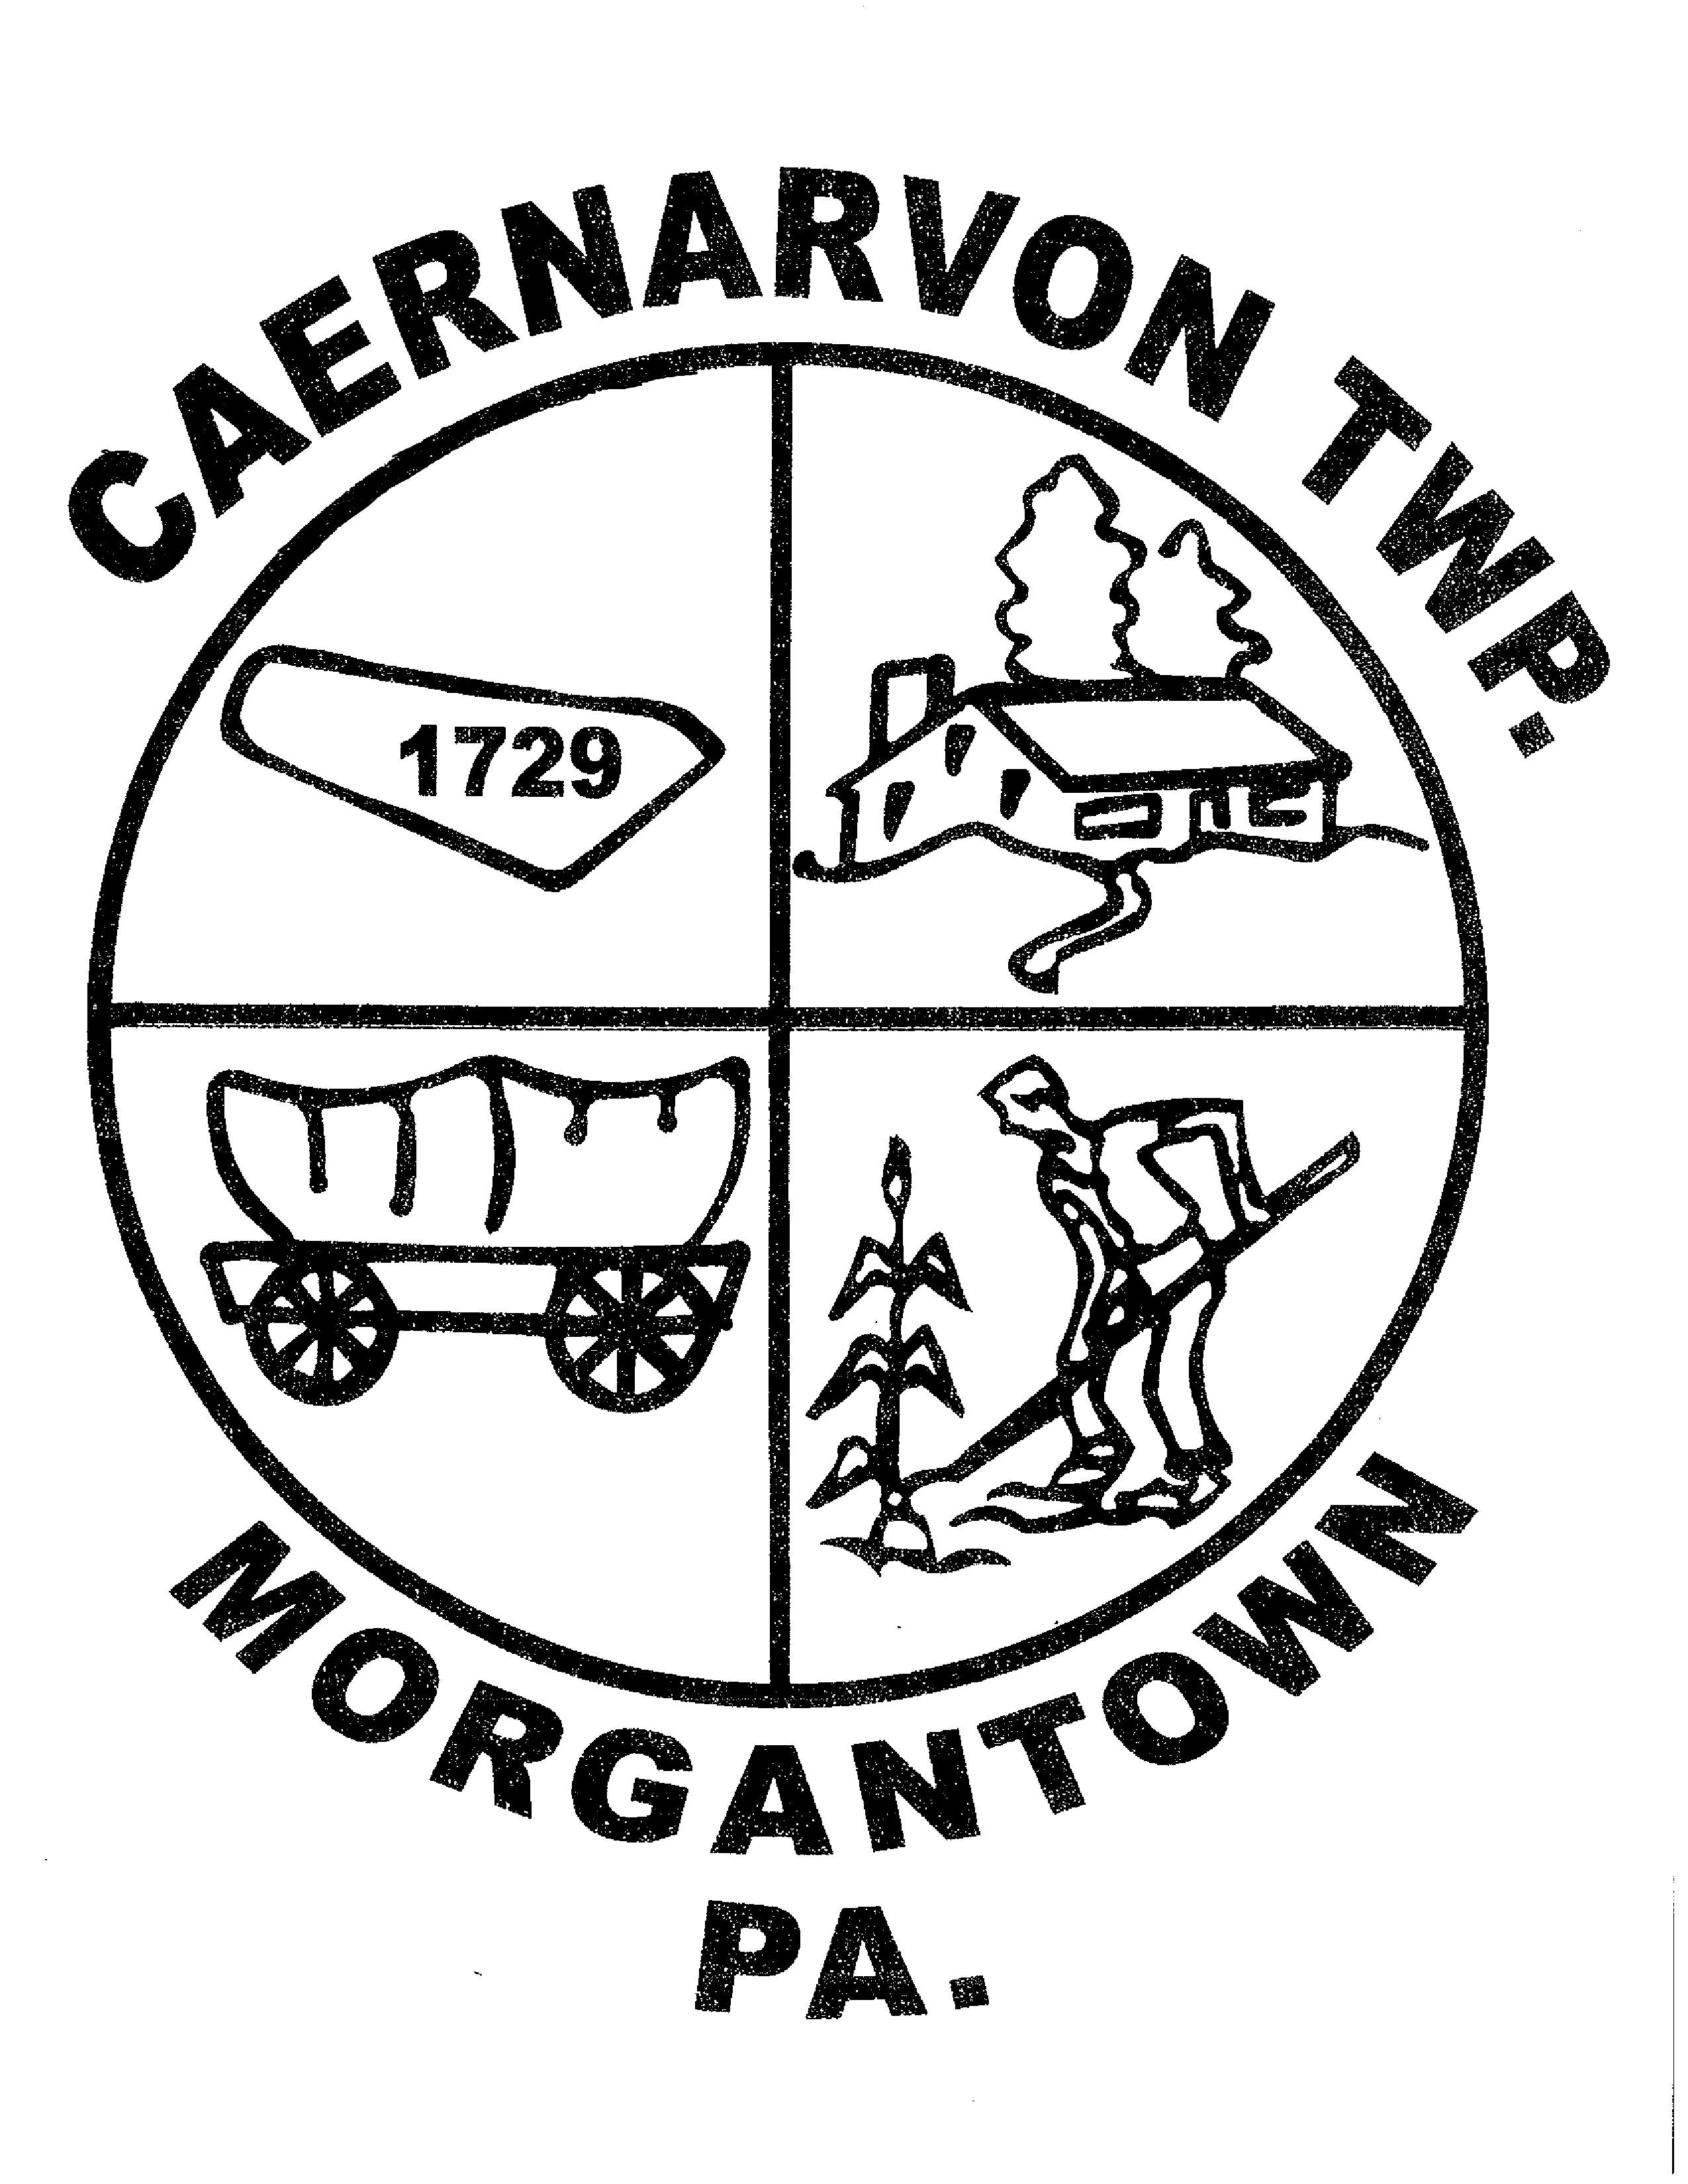 Caernarvon Township, Berks County, Pennsylvania